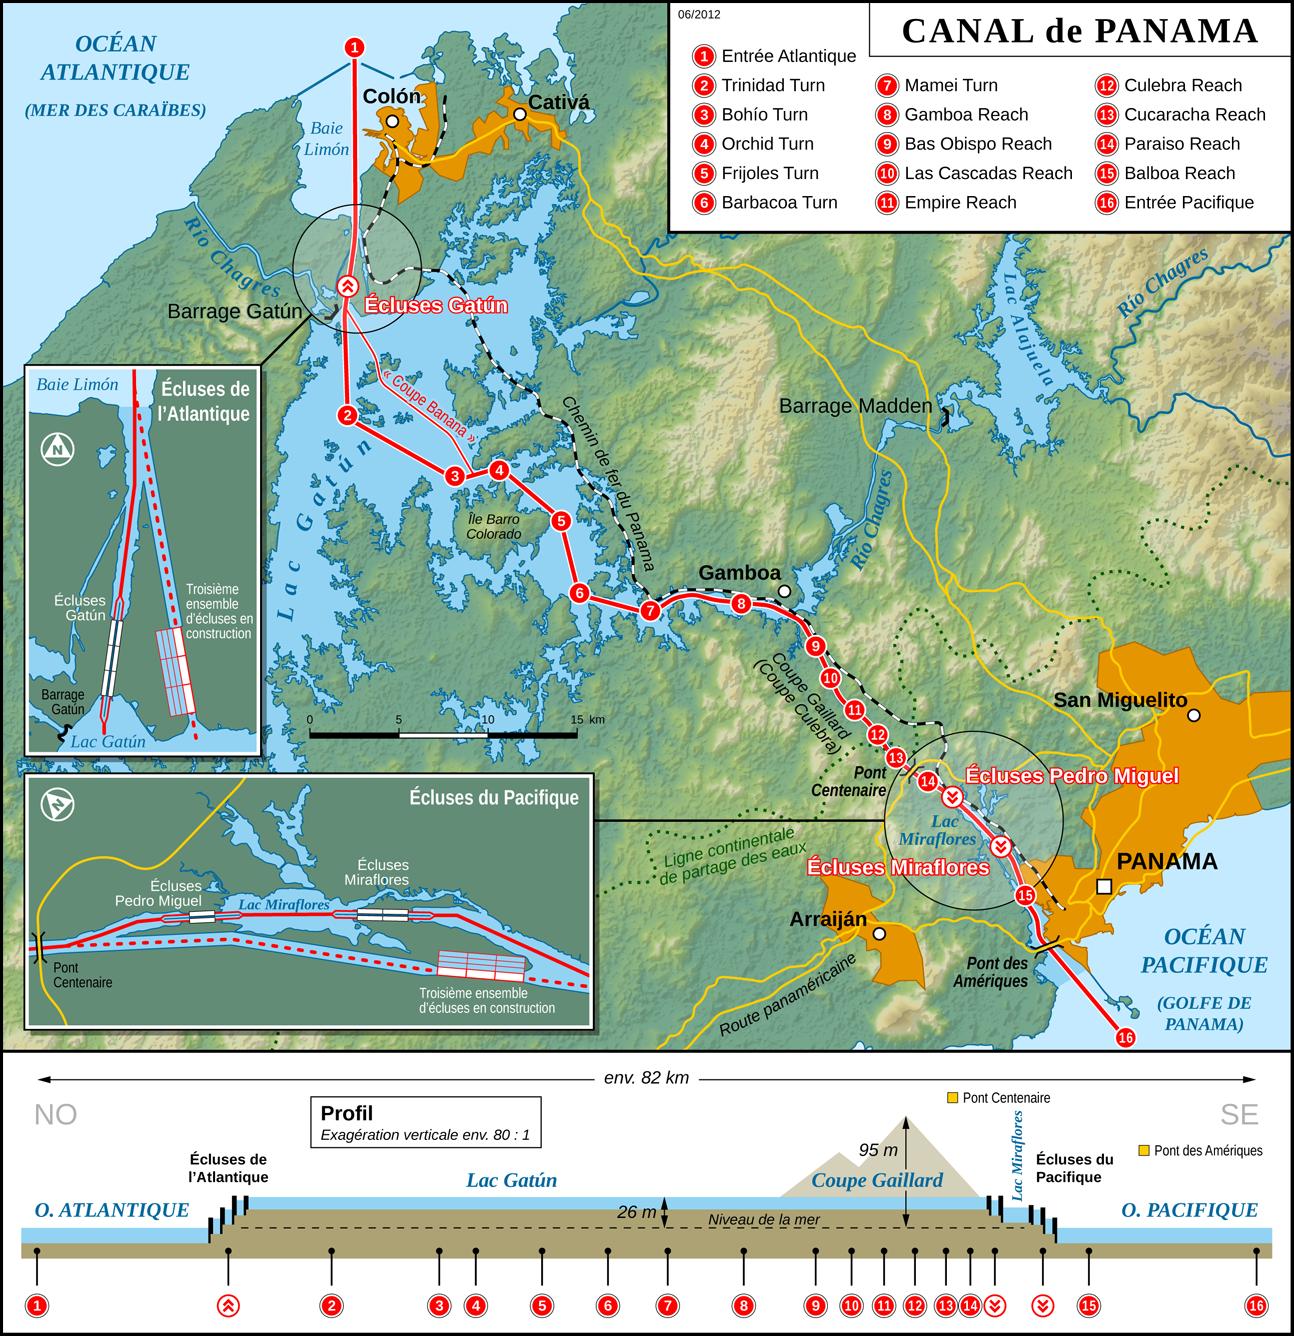 Carte du canal de Panama